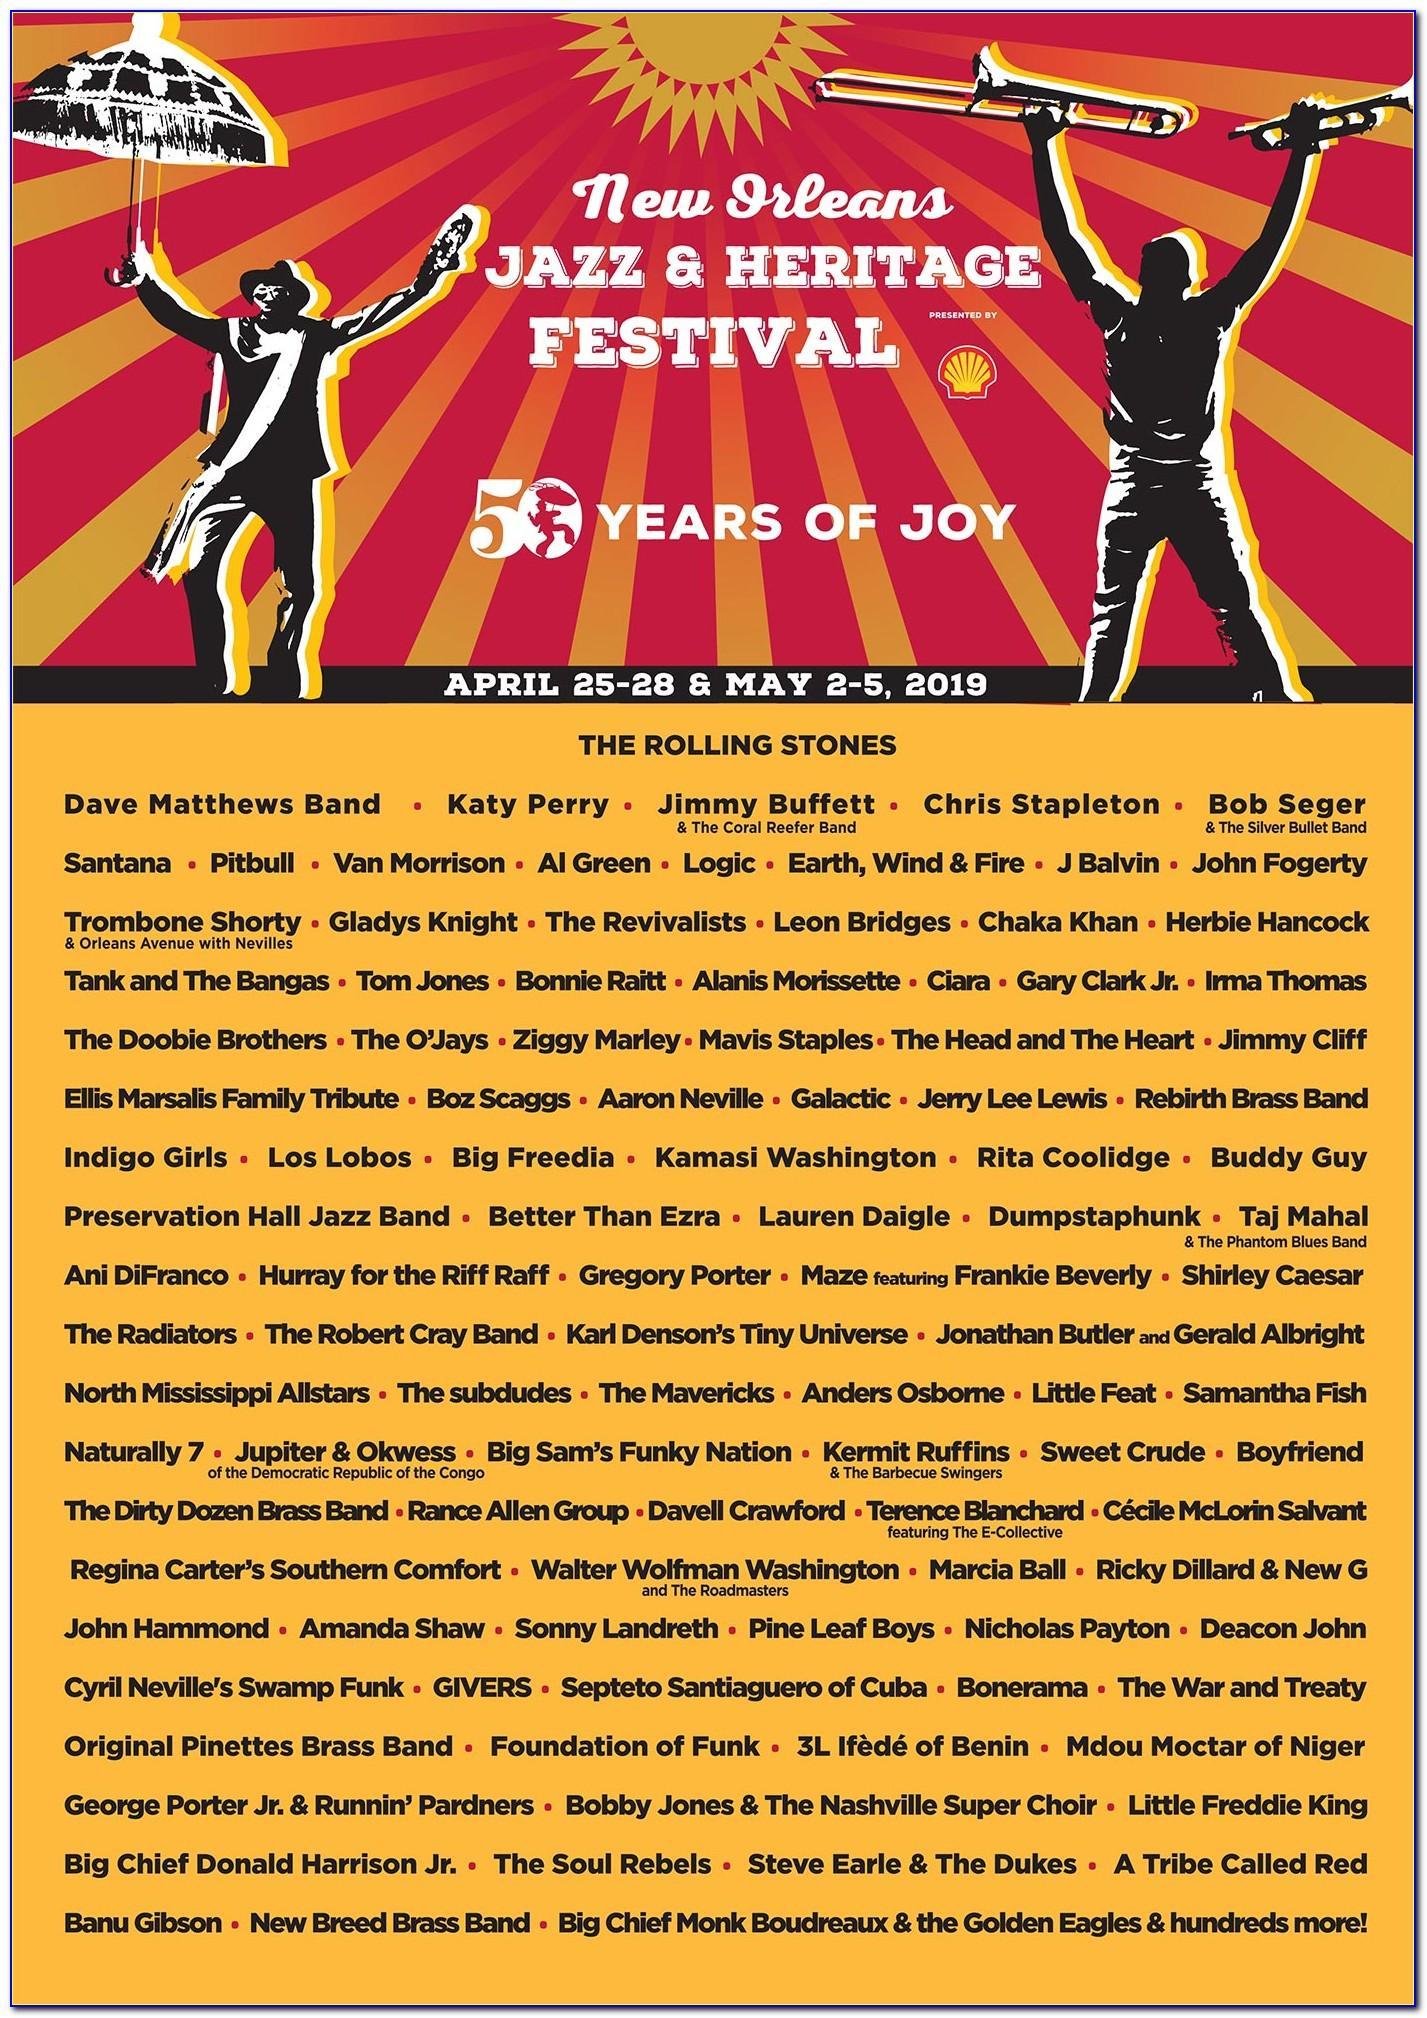 Jazz Fest Lineup Announcement 2019 Tickets